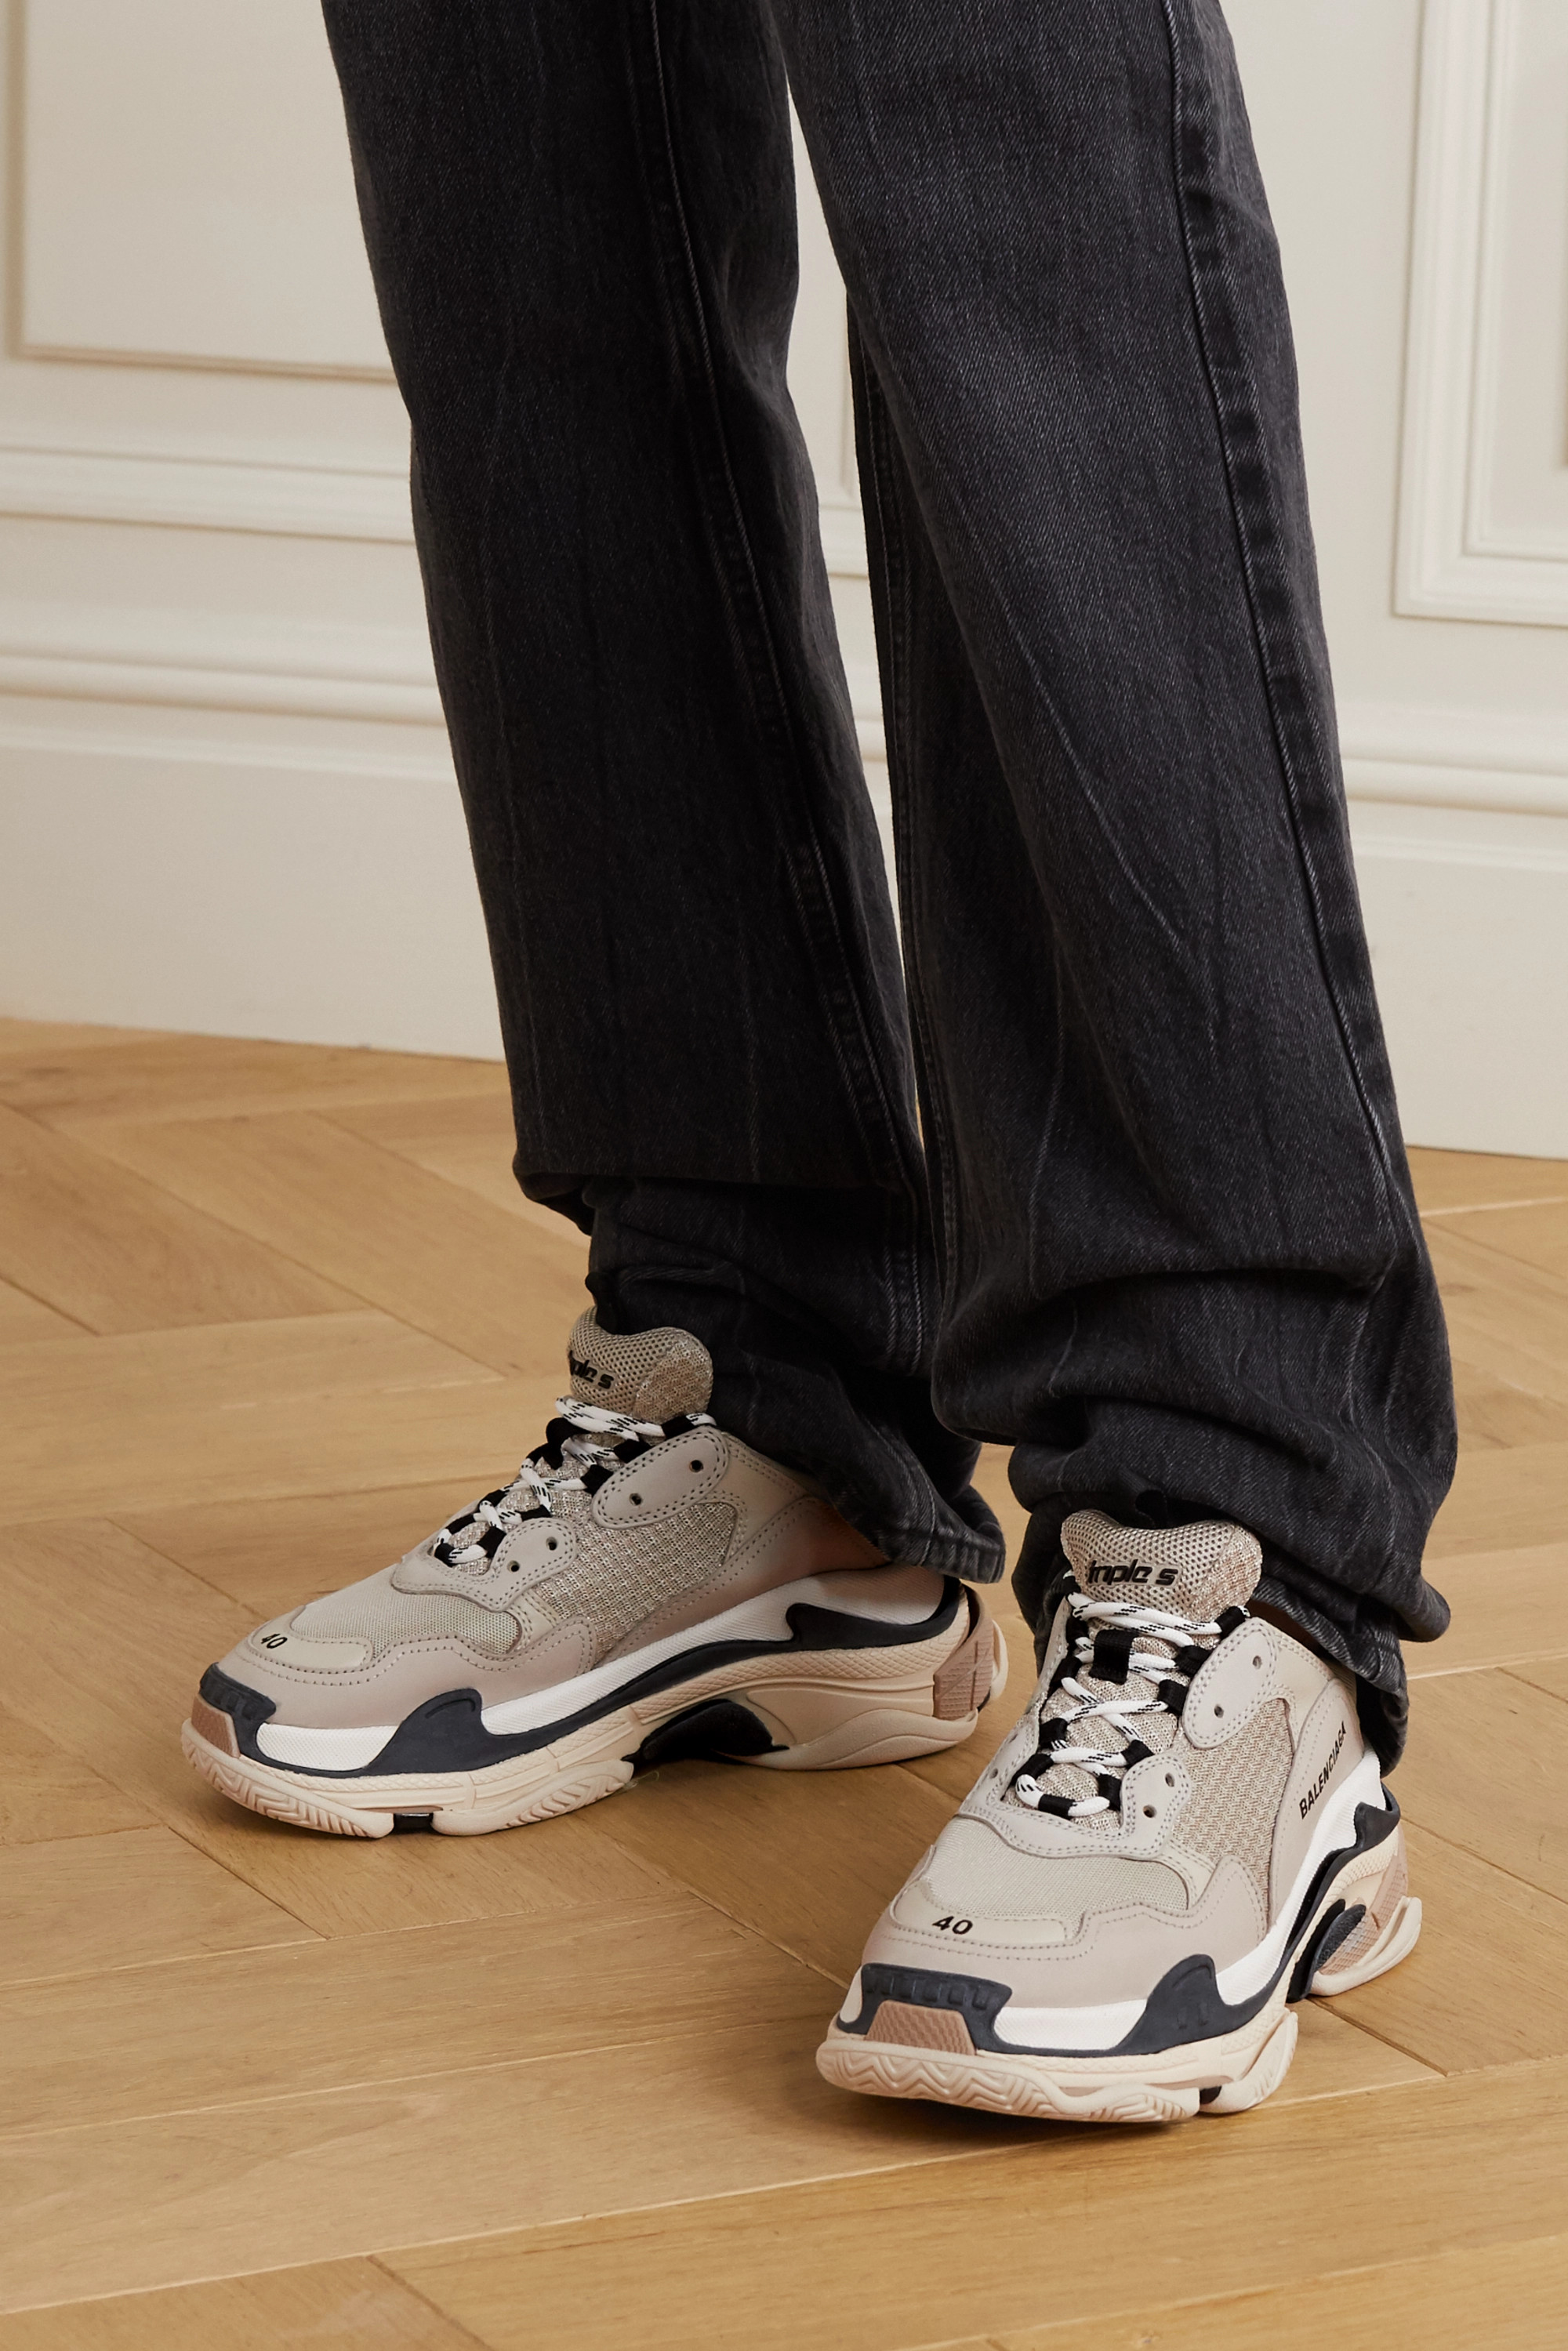 Balenciaga Triple S 品牌标志刺绣皮革网眼运动鞋